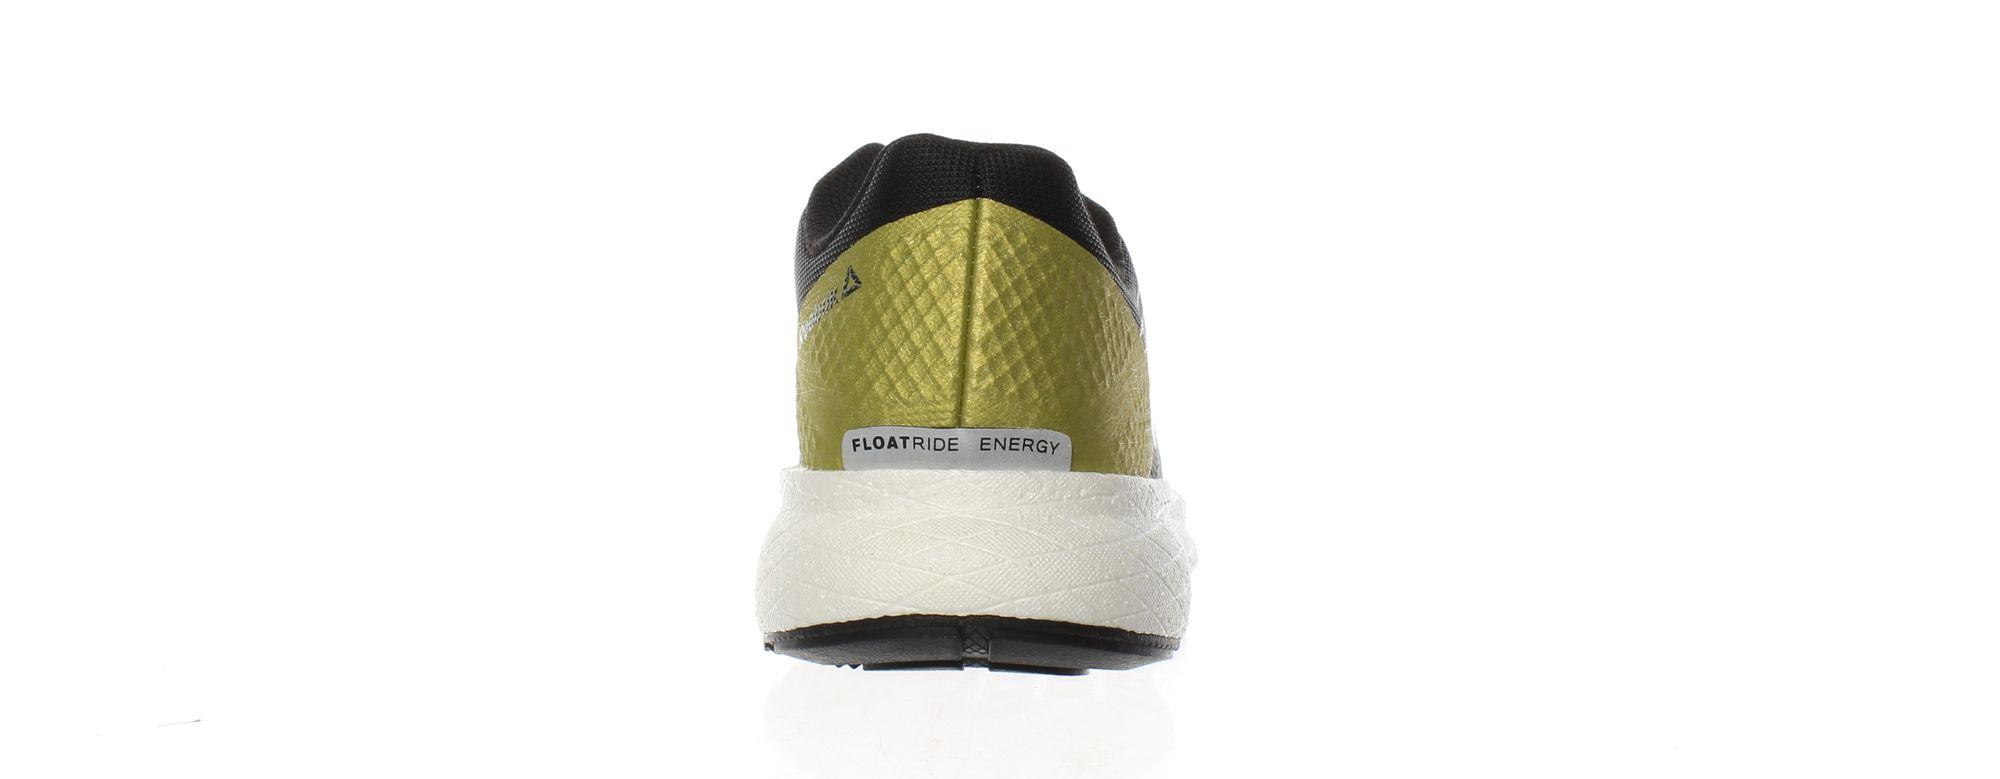 Reebok-Womens-Forever-Floatride-Energy-Running-Shoes thumbnail 8